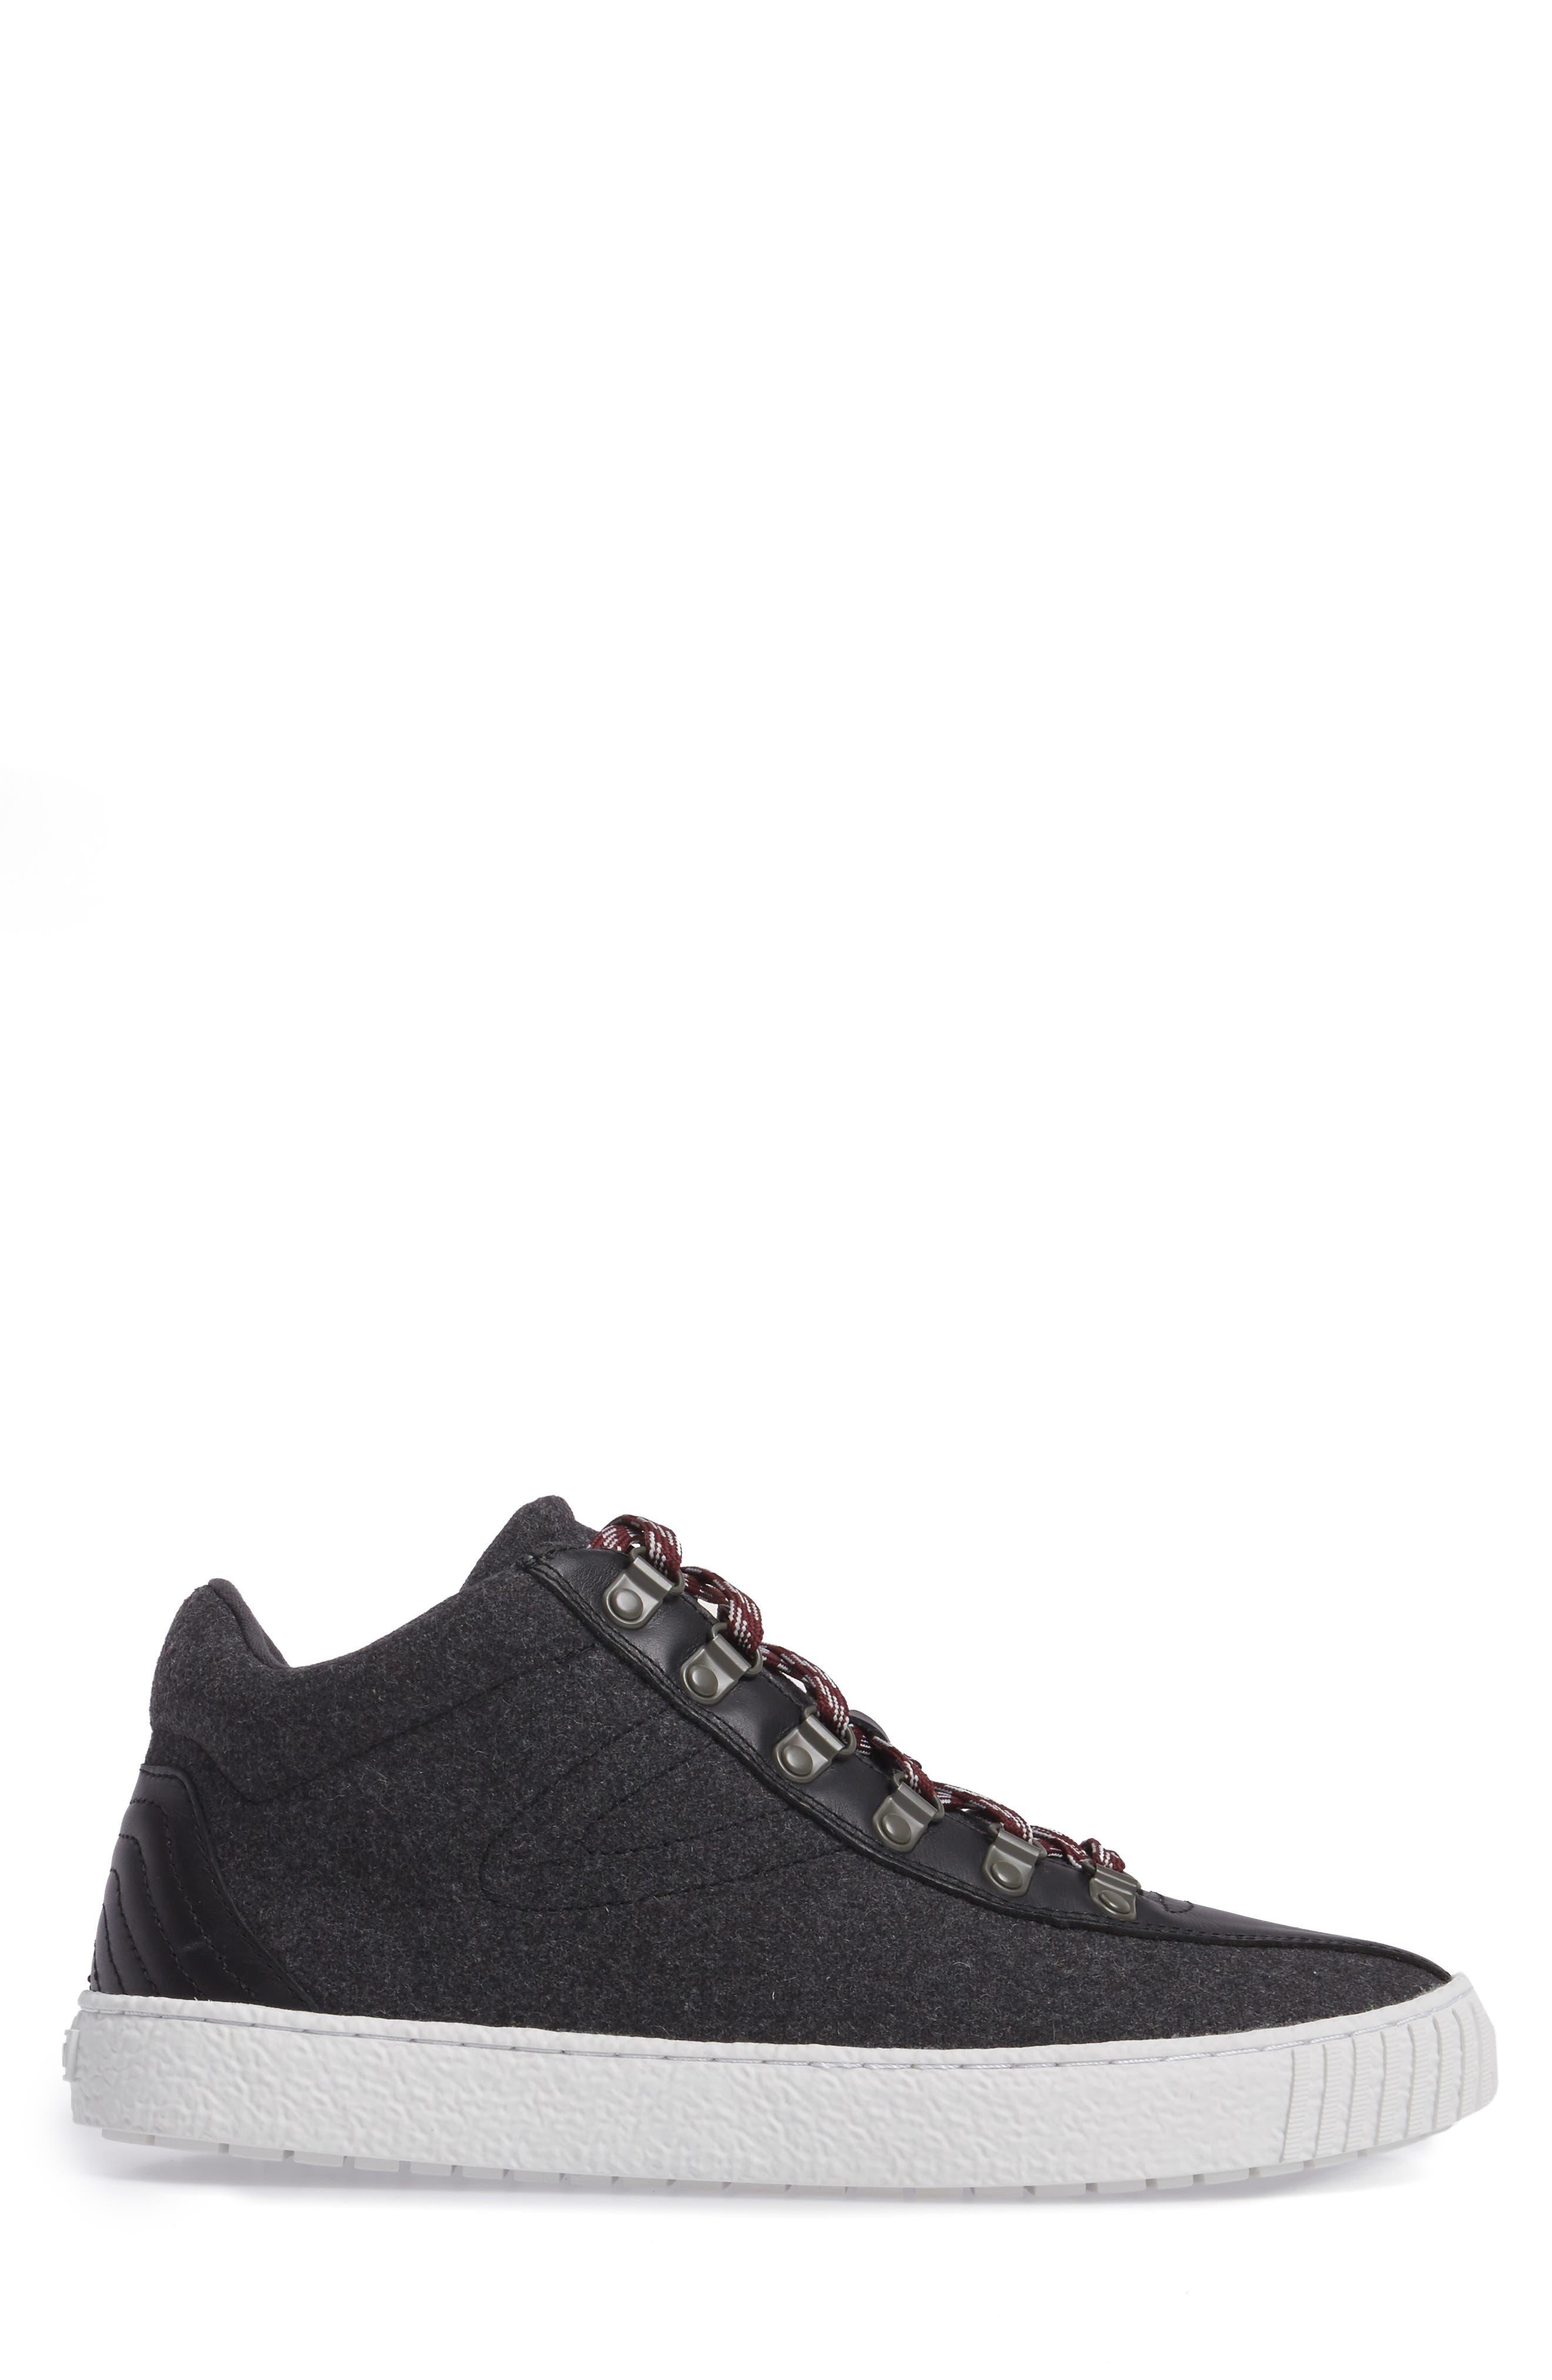 Dante Sneaker,                             Alternate thumbnail 3, color,                             Dark Grey/ Black